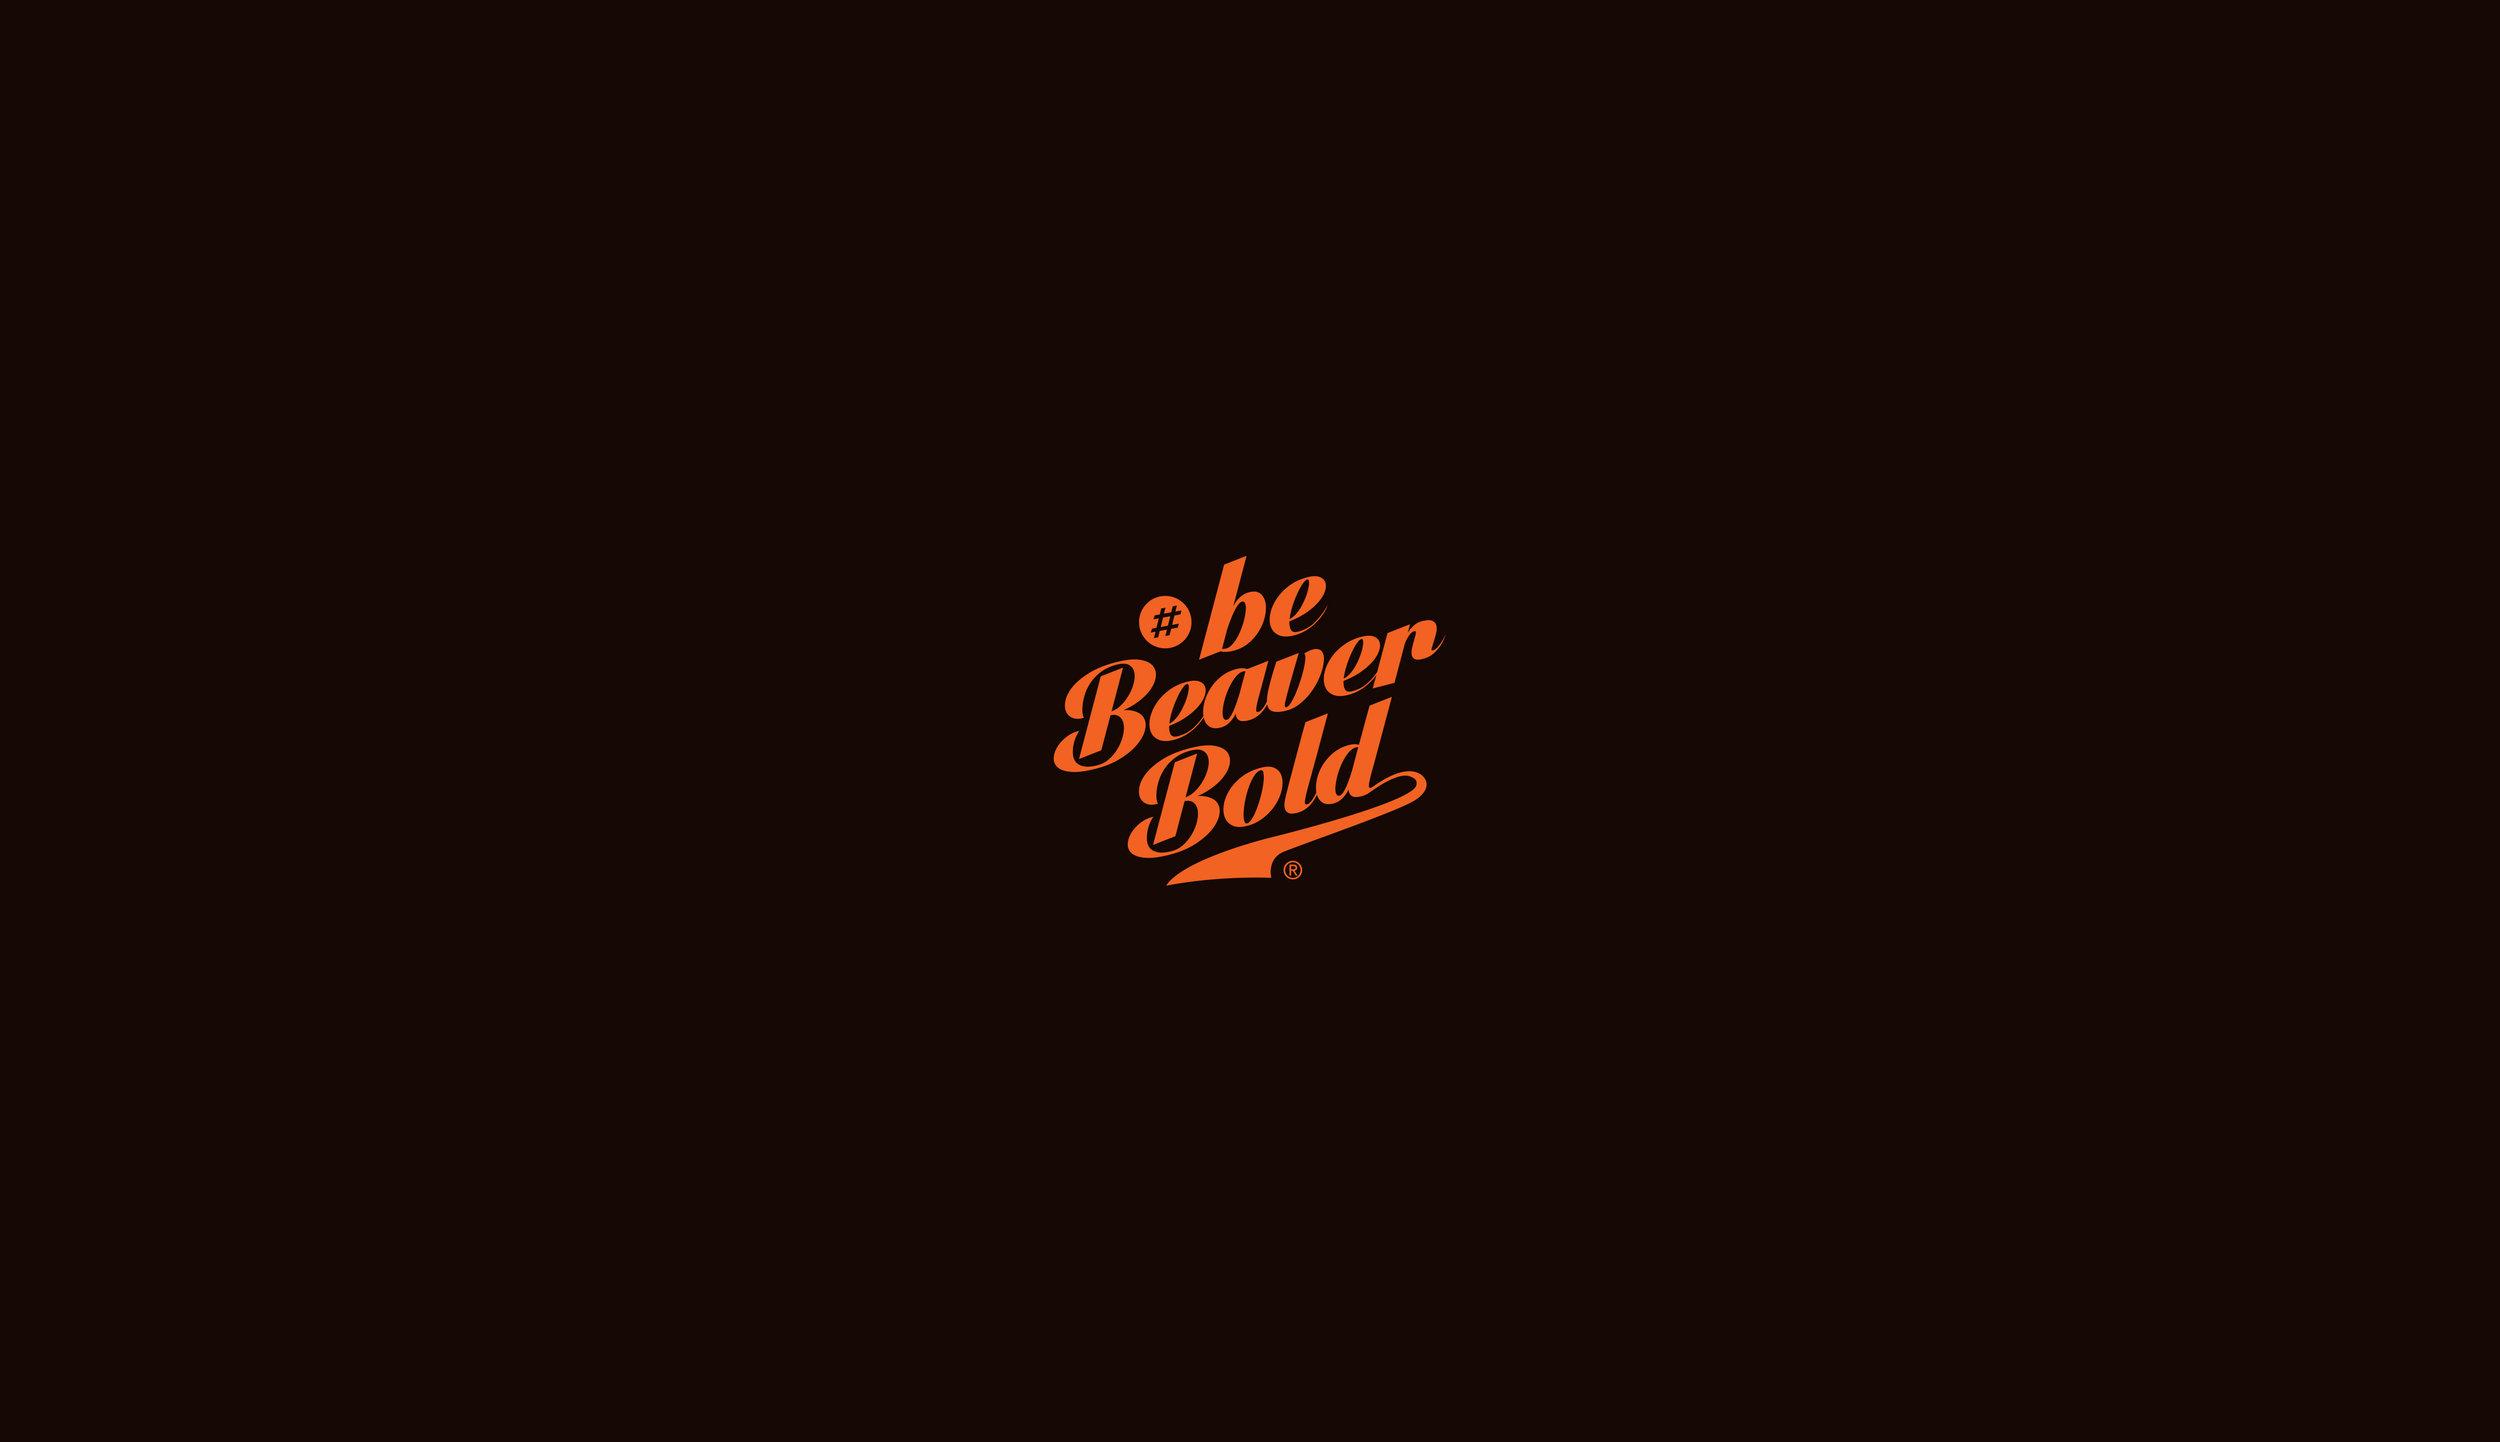 Be Beaver Bold.jpg